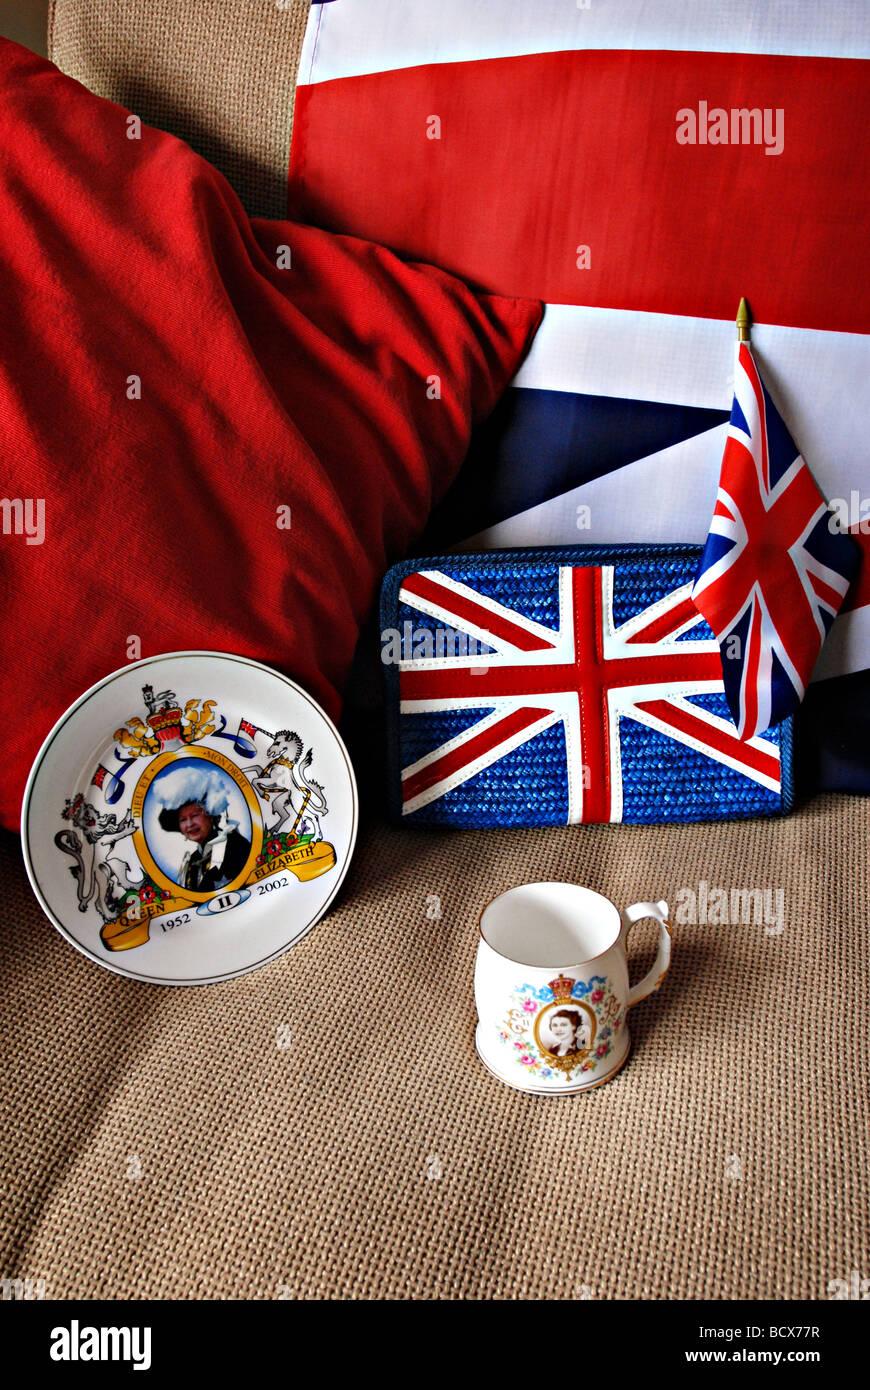 Patriotism - Stock Image